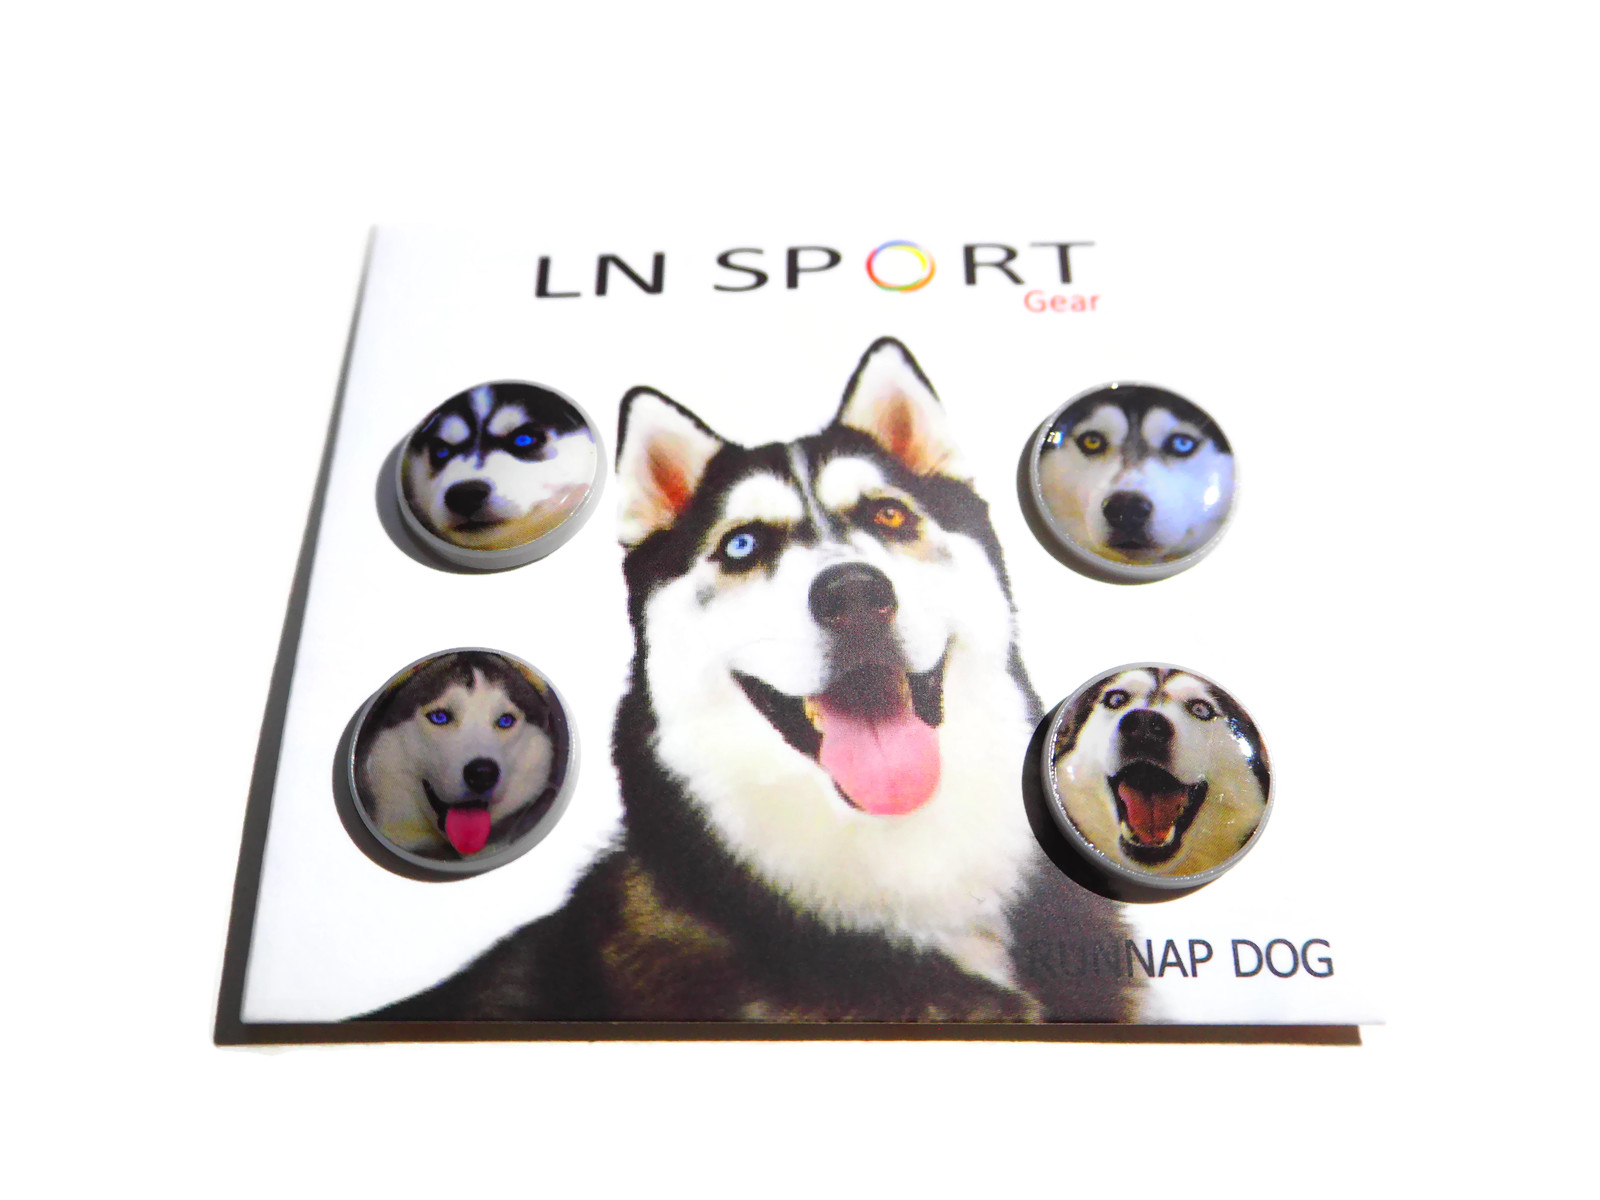 LN Sport ตัวติดเบอร์วิ่ง Runnap (BIB Race Number Holder) ลายสุนัขไซบีเลี่ยน